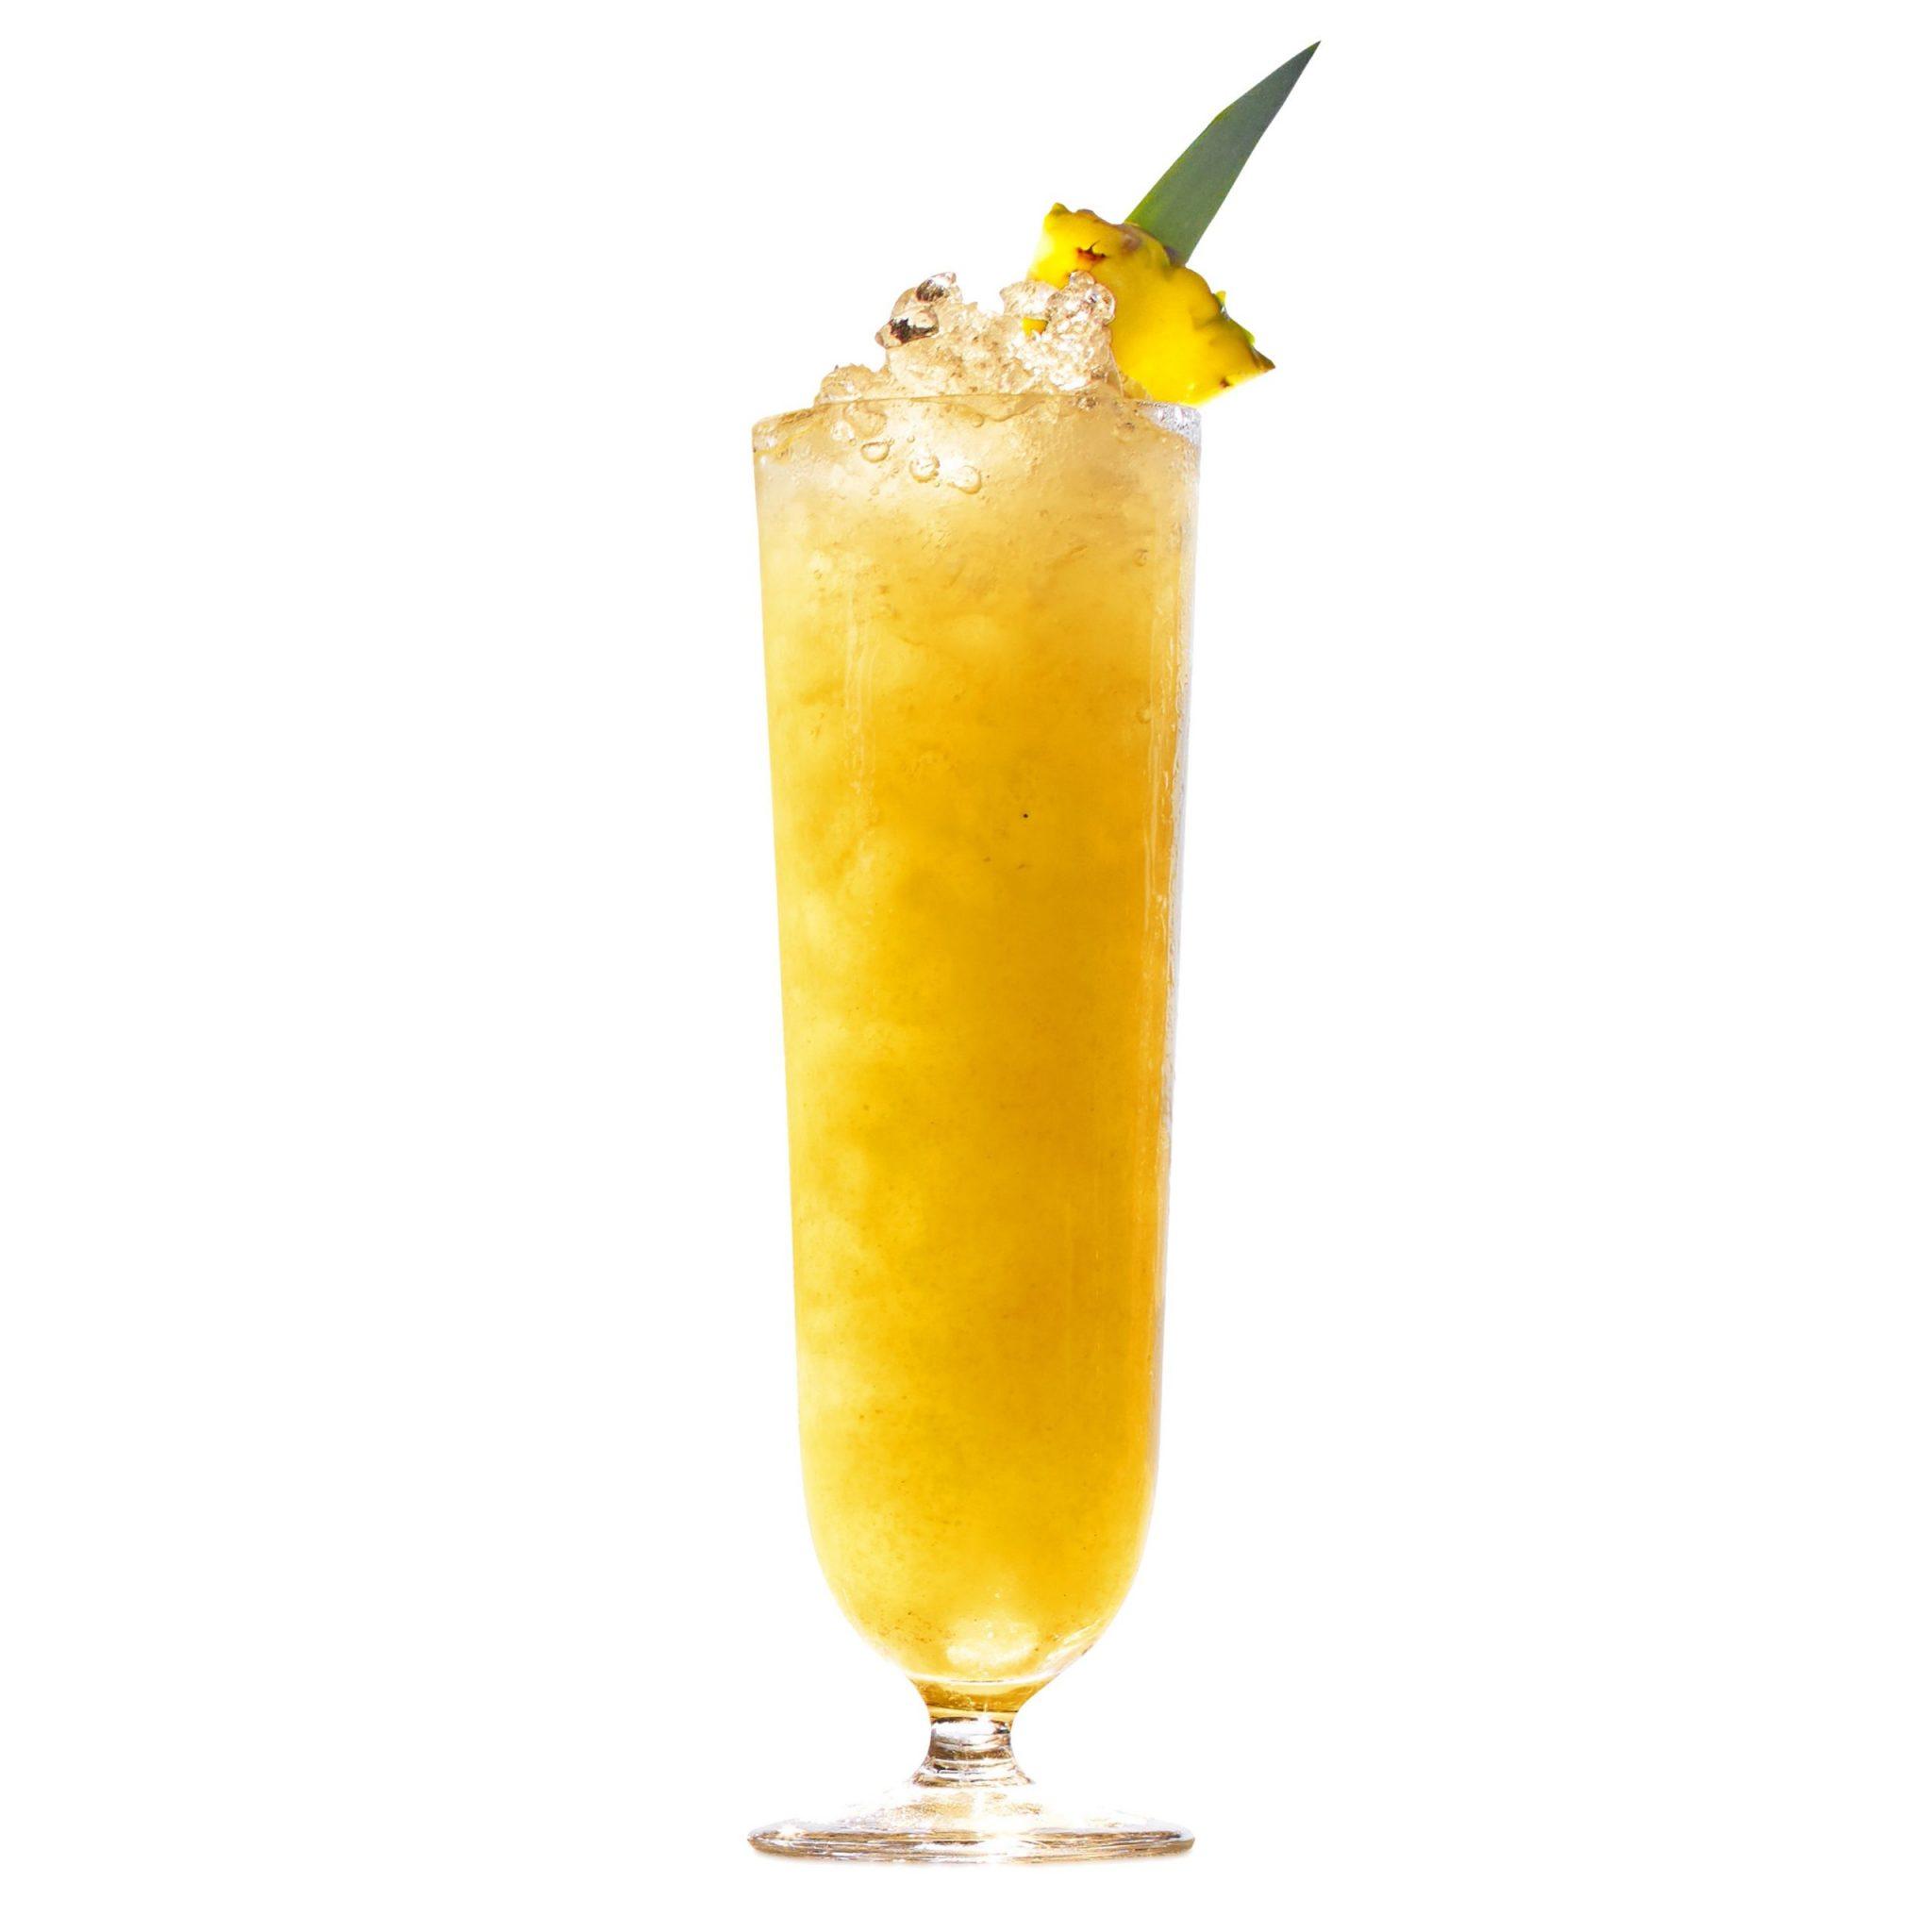 BACARDÍ Rum - Piña Colada - Cut out